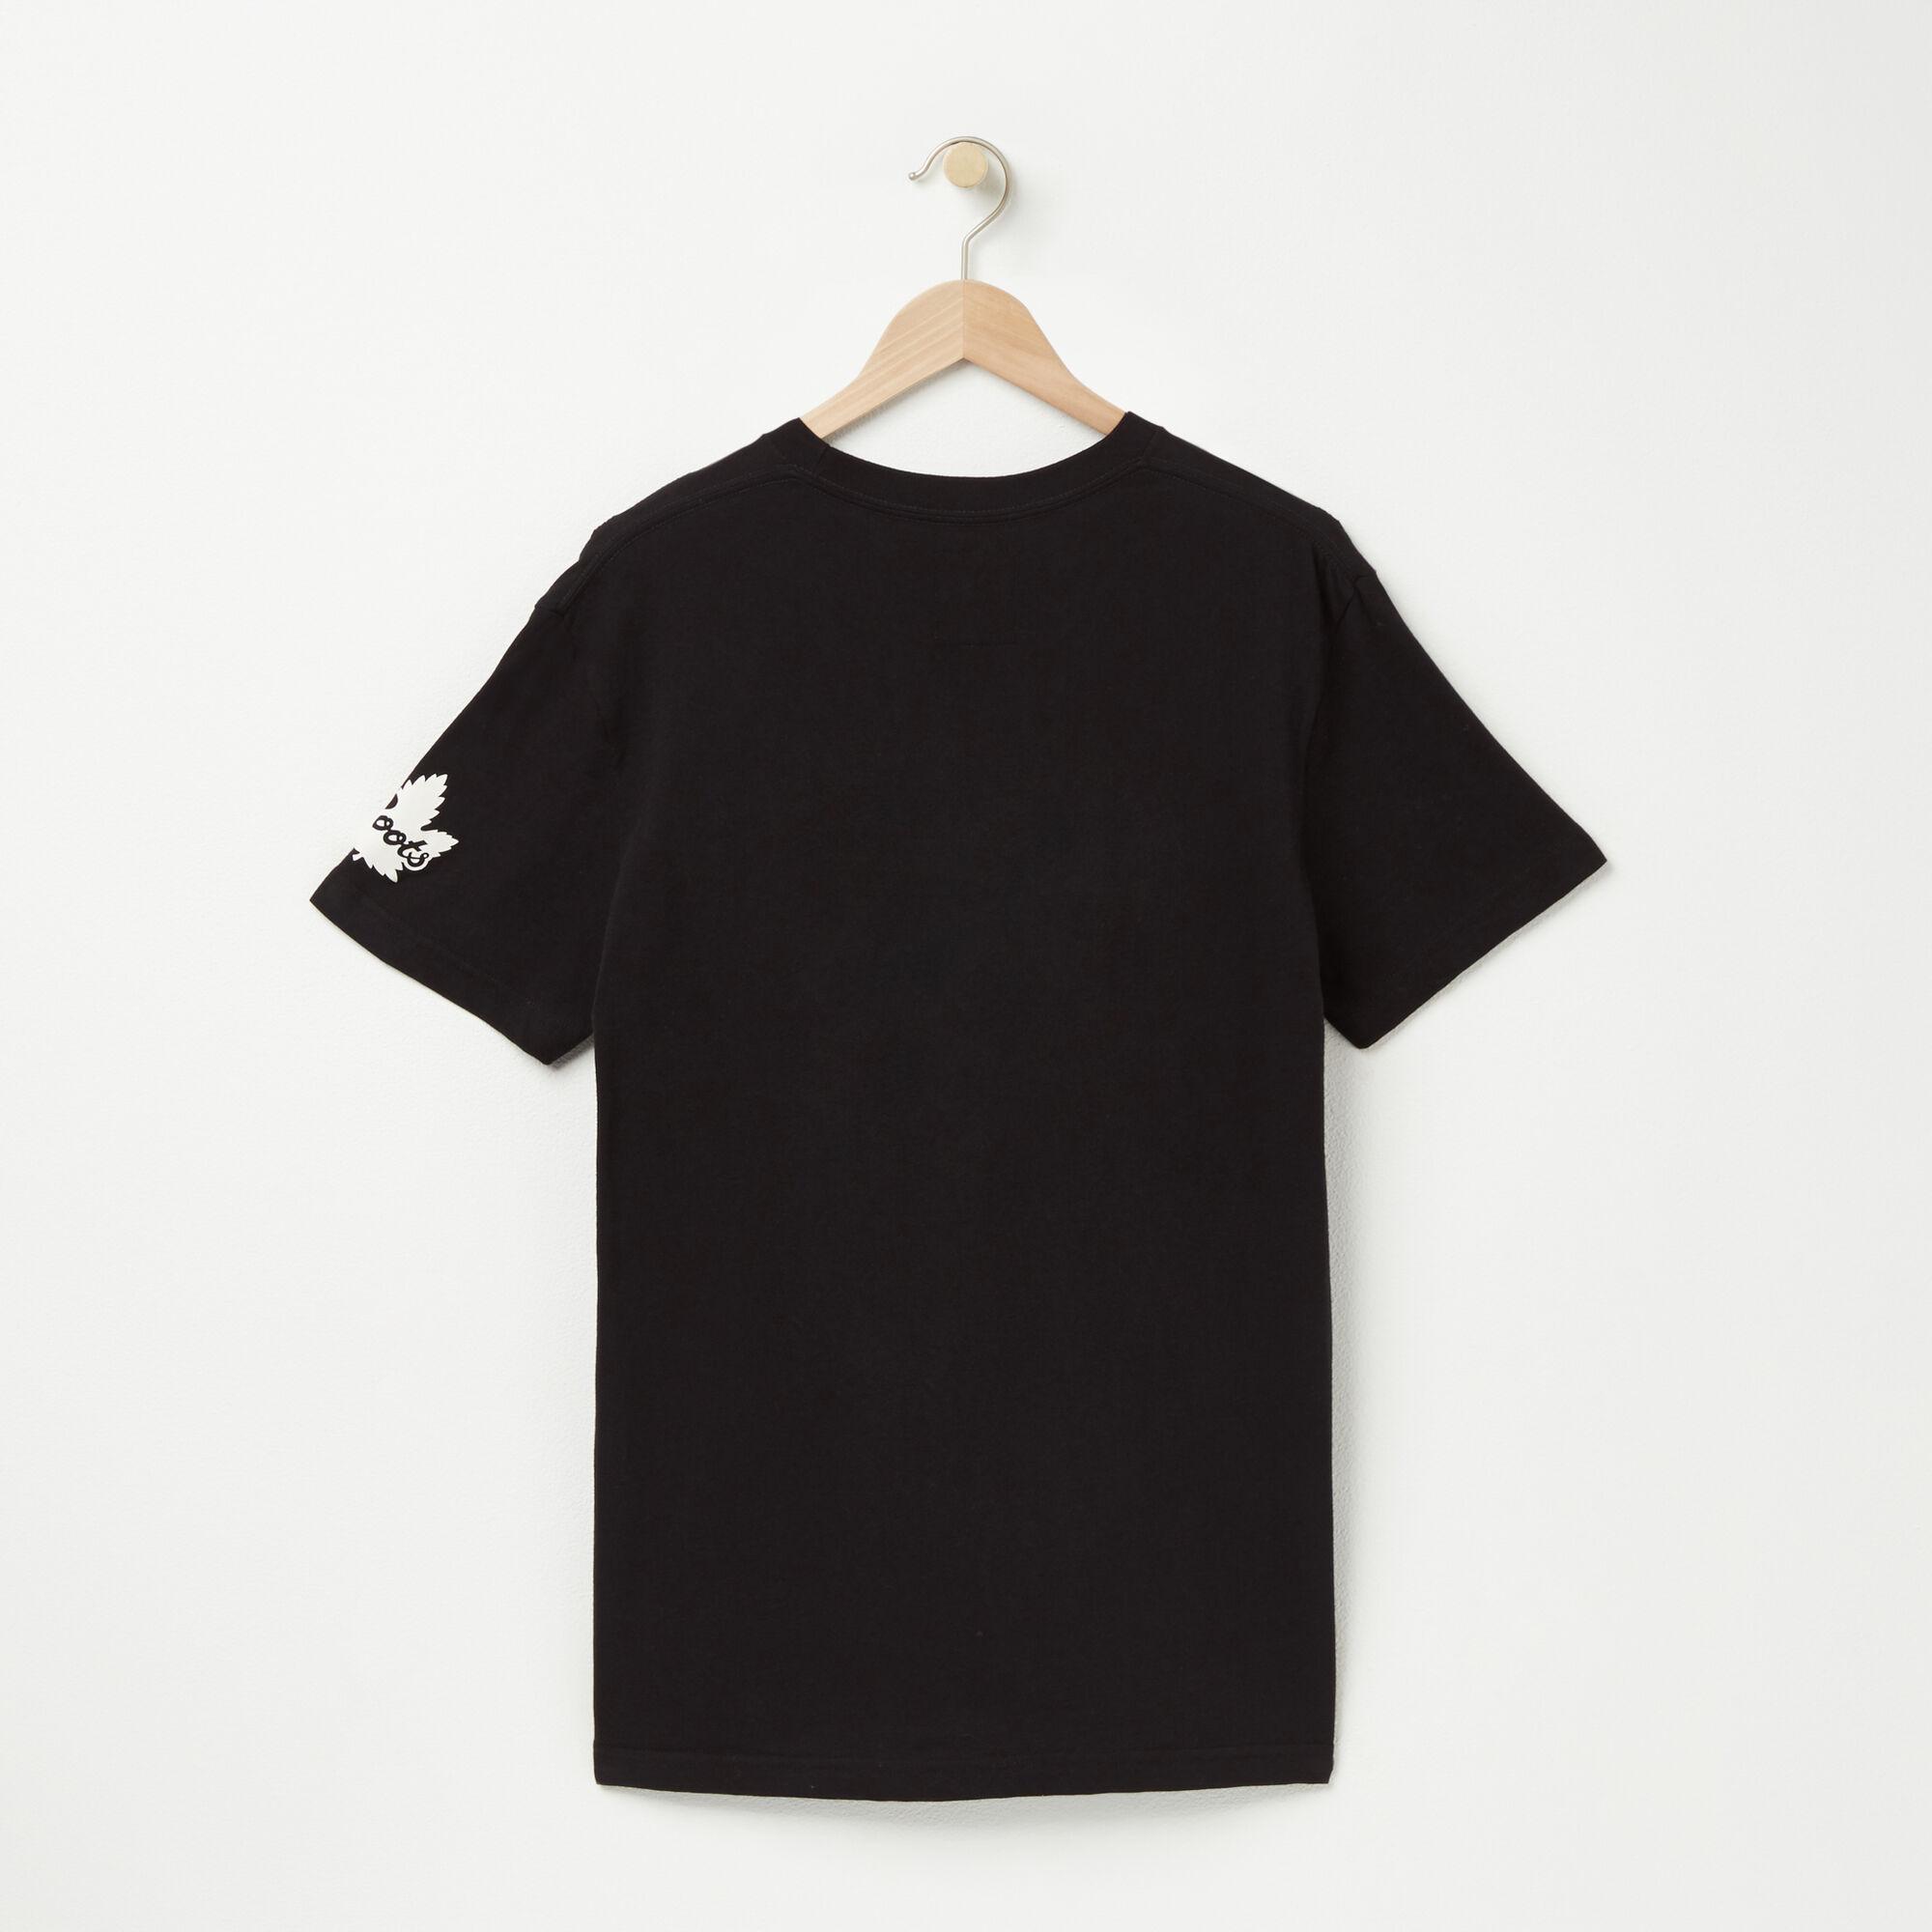 T-Shirt Héritage Roots